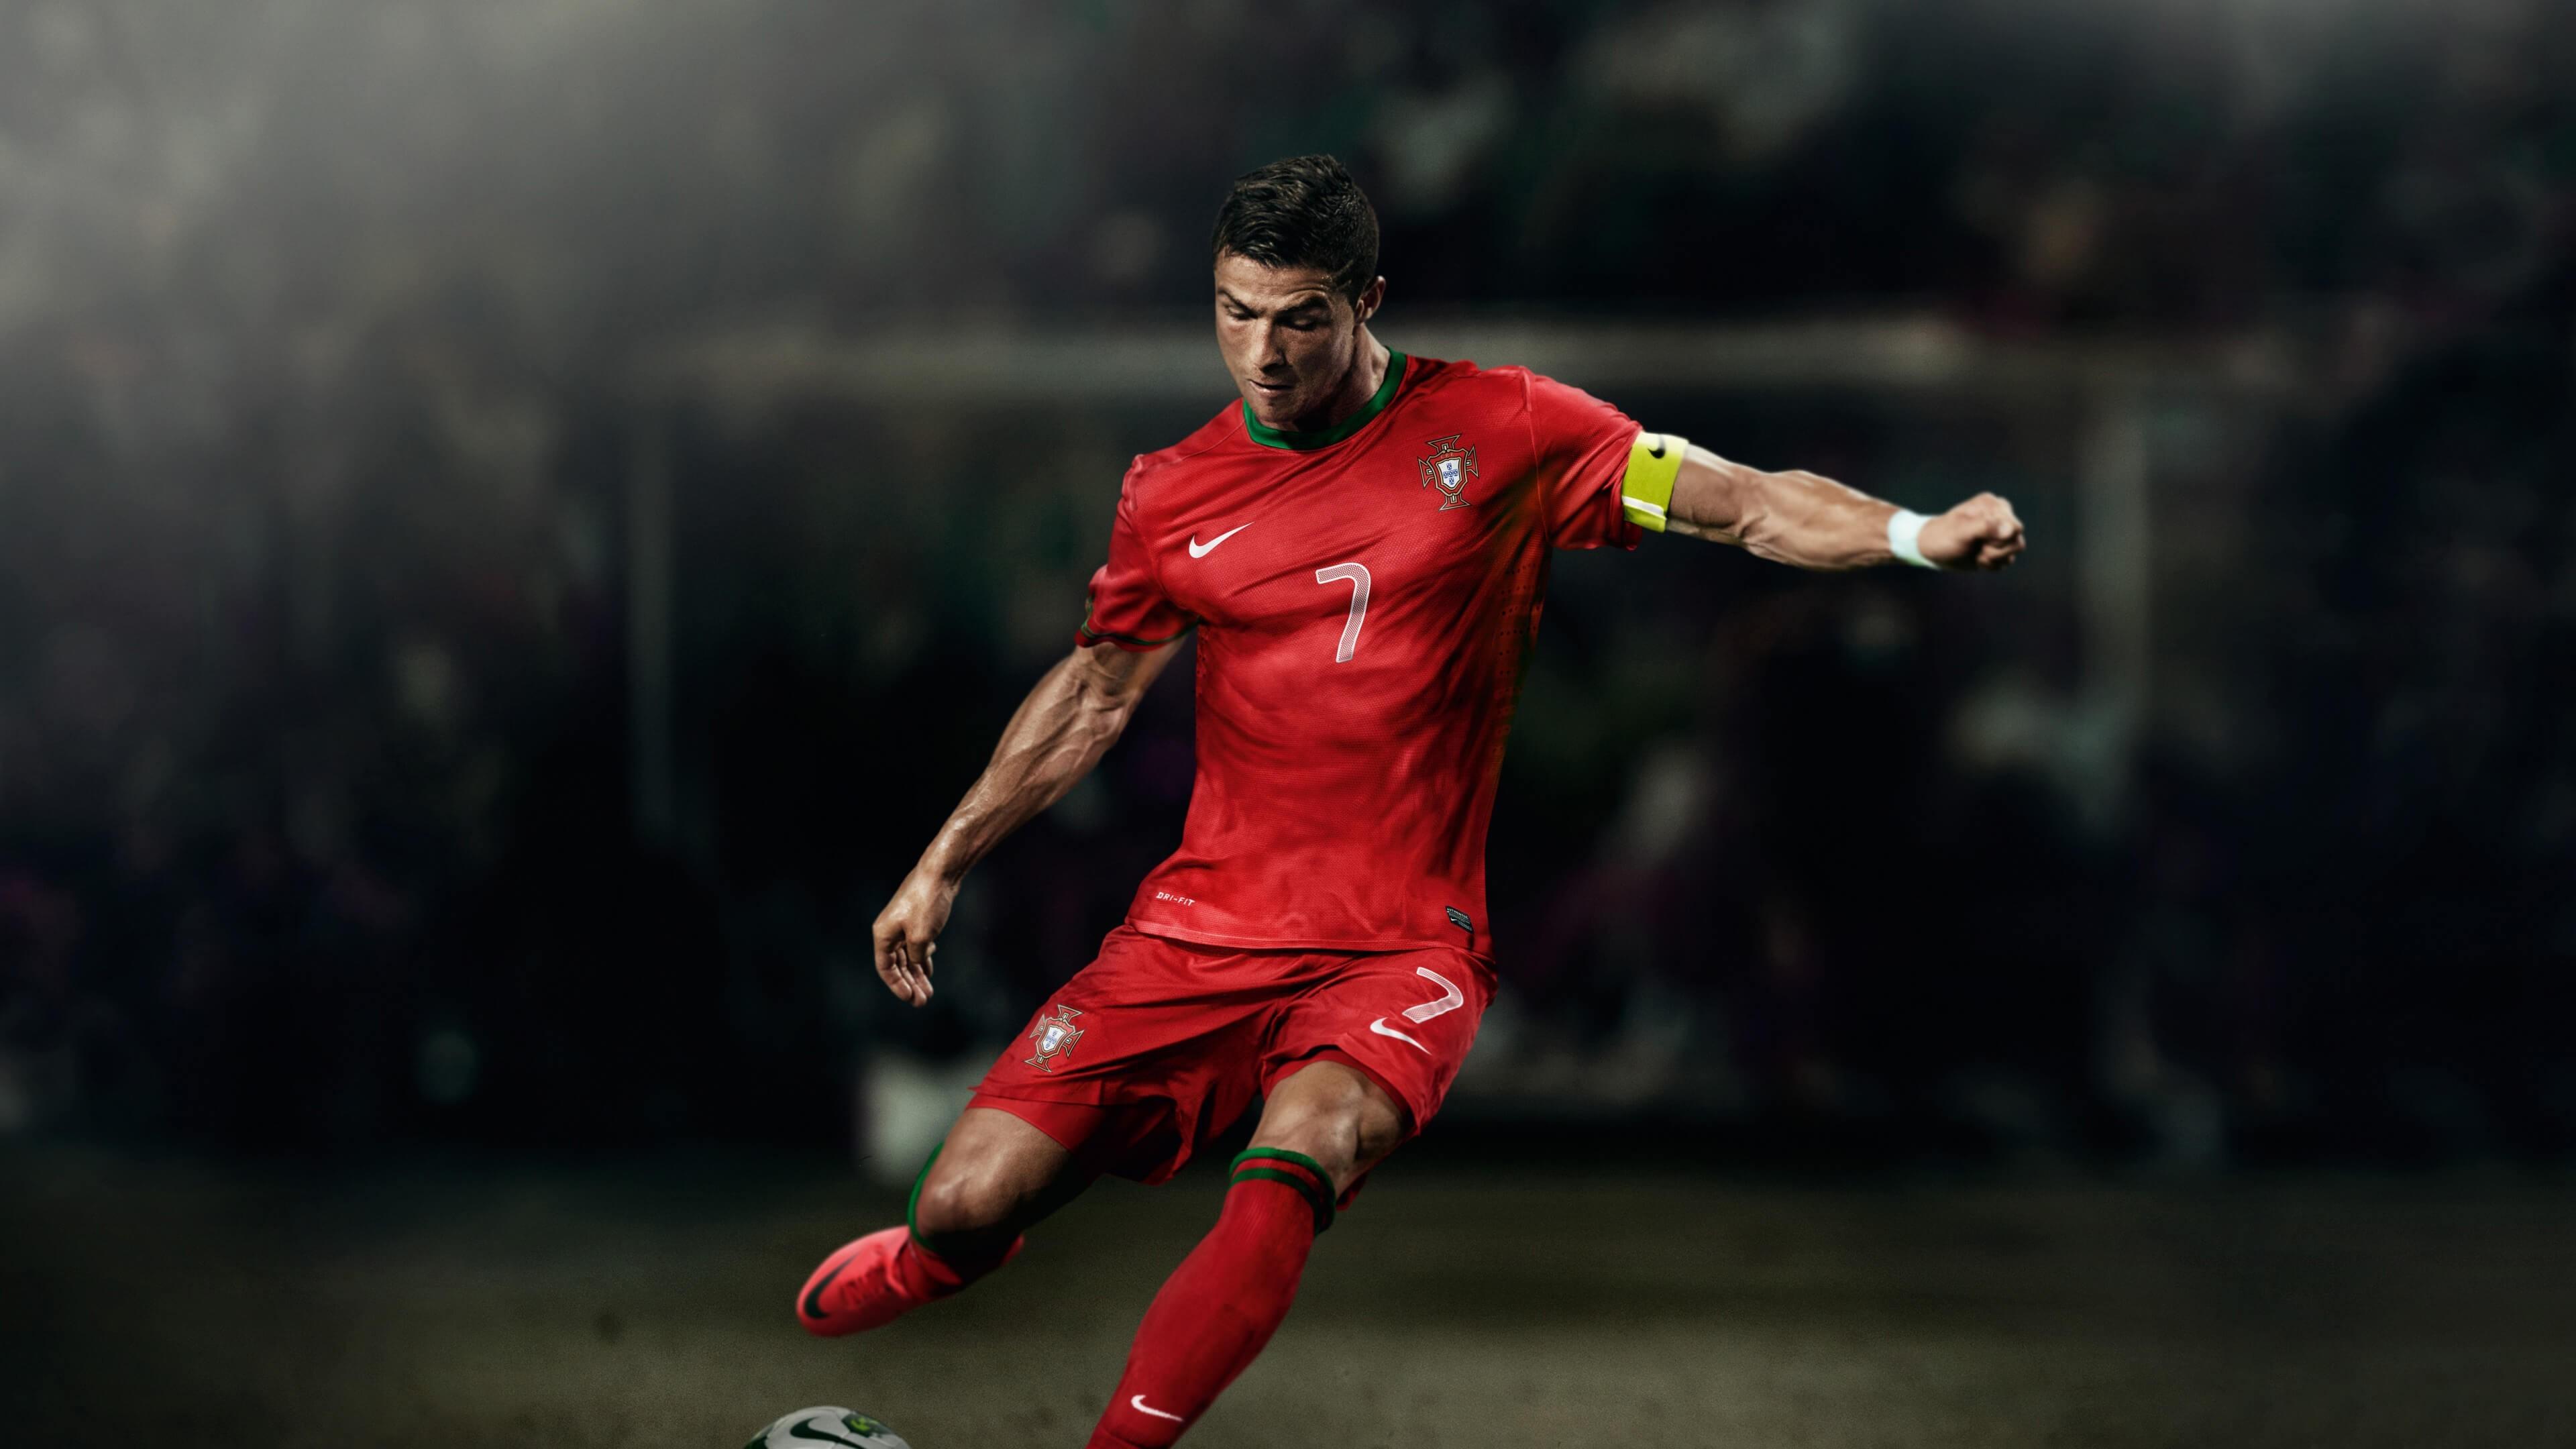 Cr7 Hd Wallpapers 1080p Cristiano Ronaldo Wallpaper Nike Mercurial 2018 55 Images